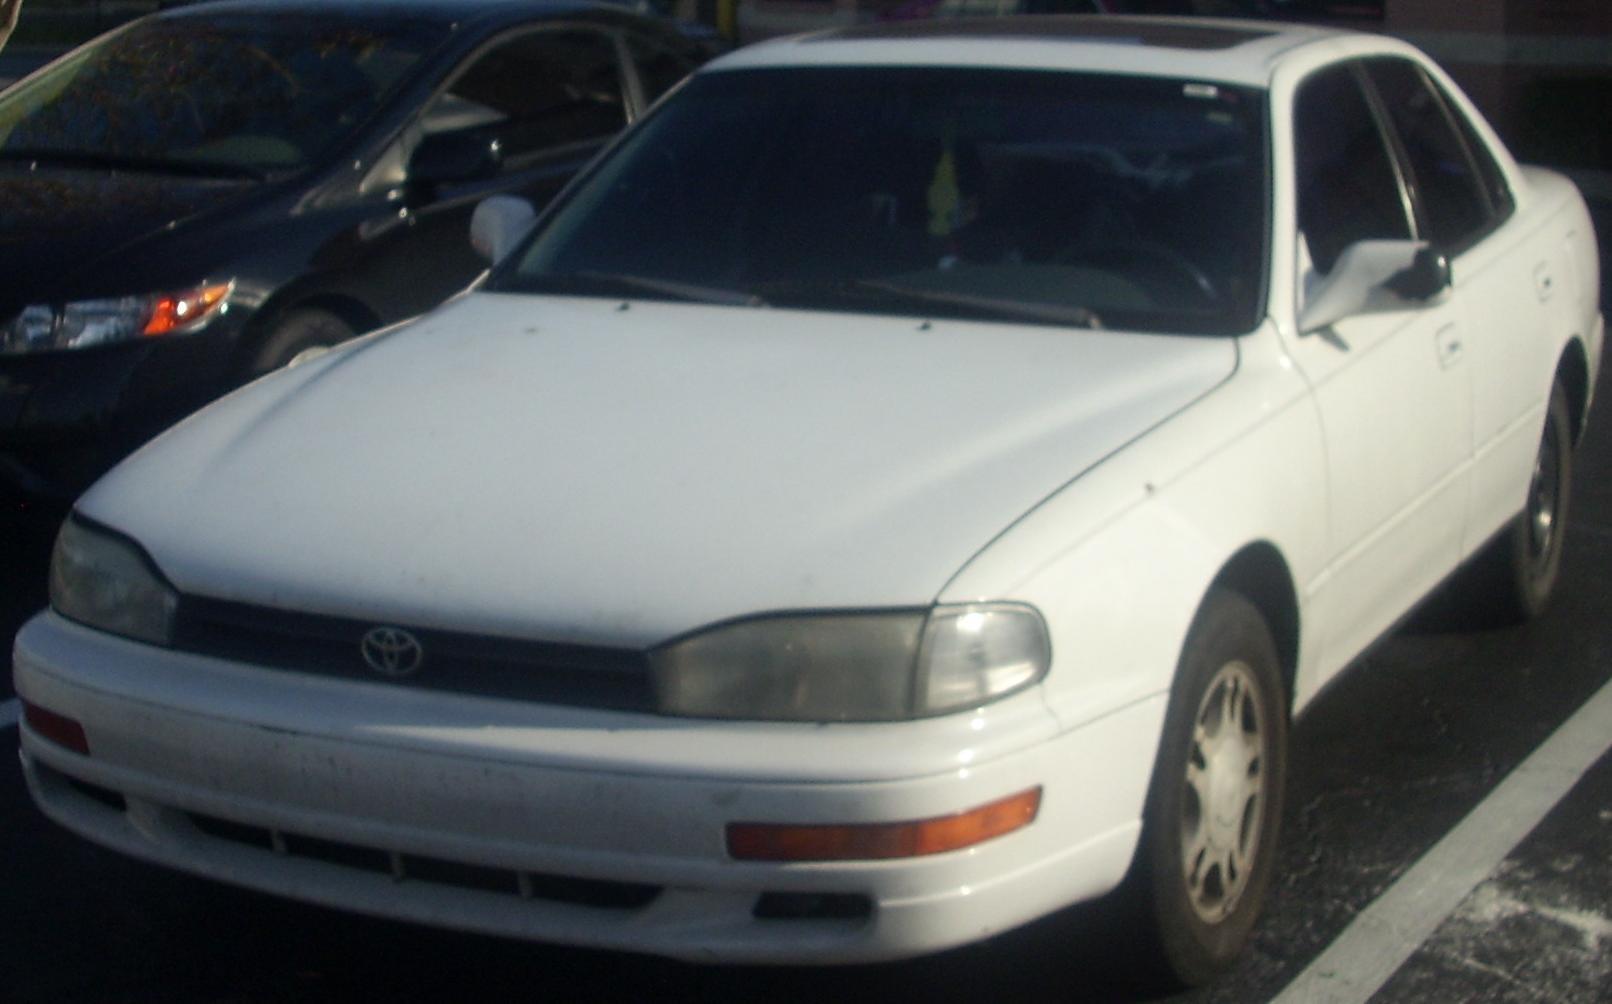 File Toyota Camry Sedan 92 94 Jpg Wikimedia Commons